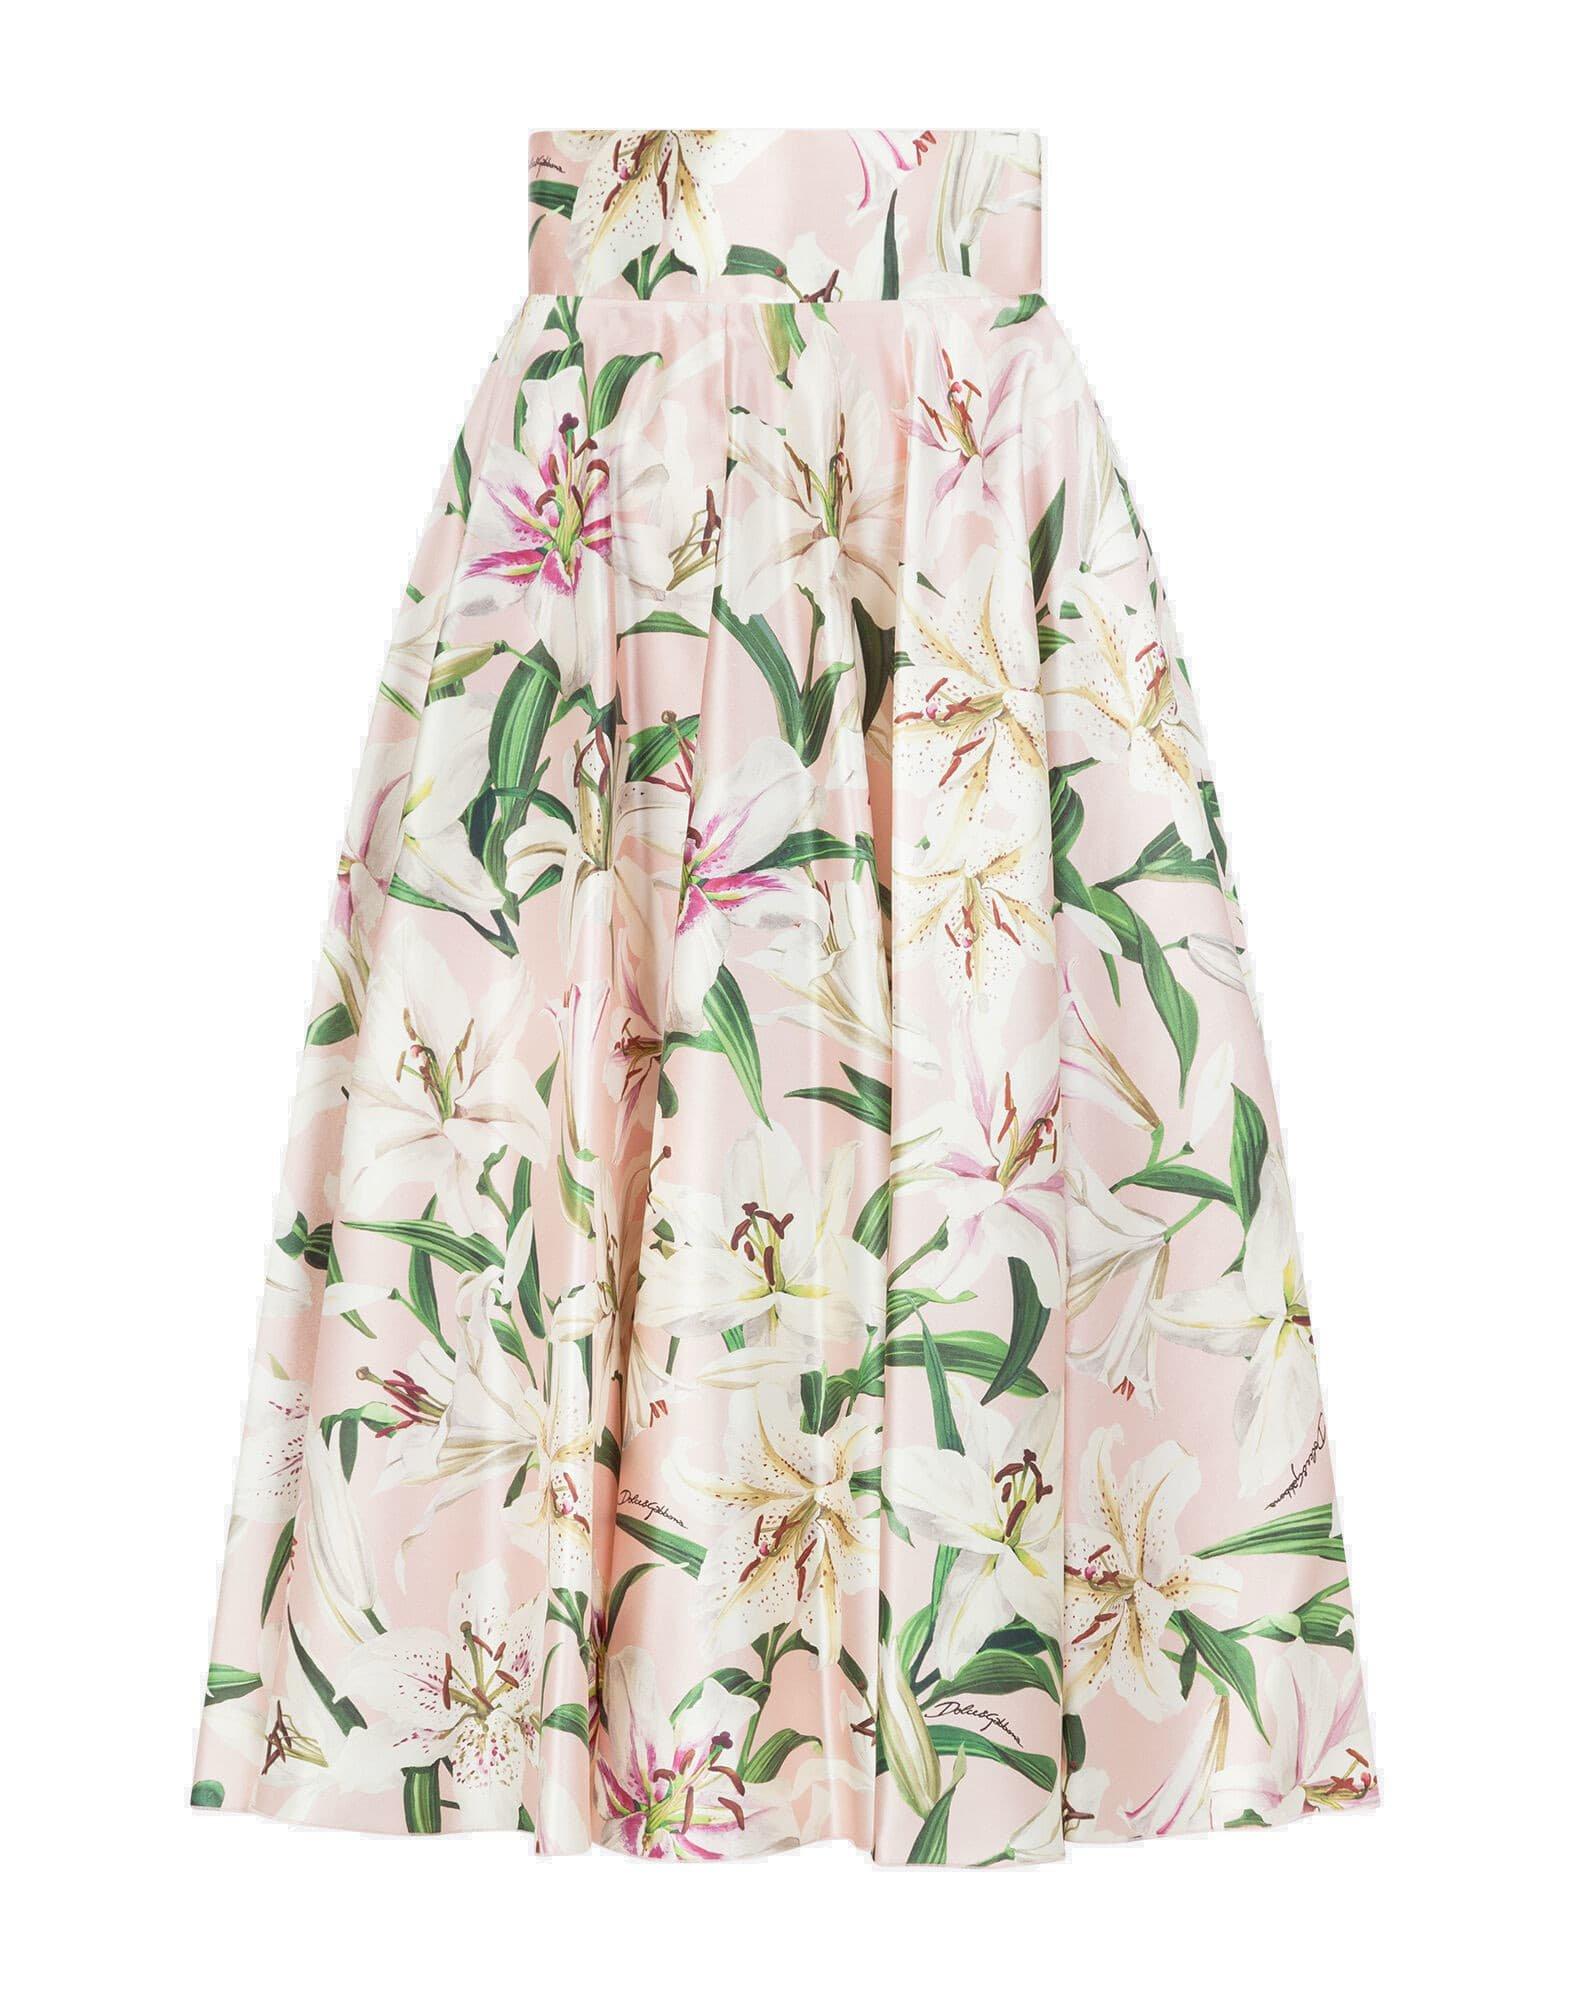 Dolce & Gabbana Silk Flower Print Skirt/gigli